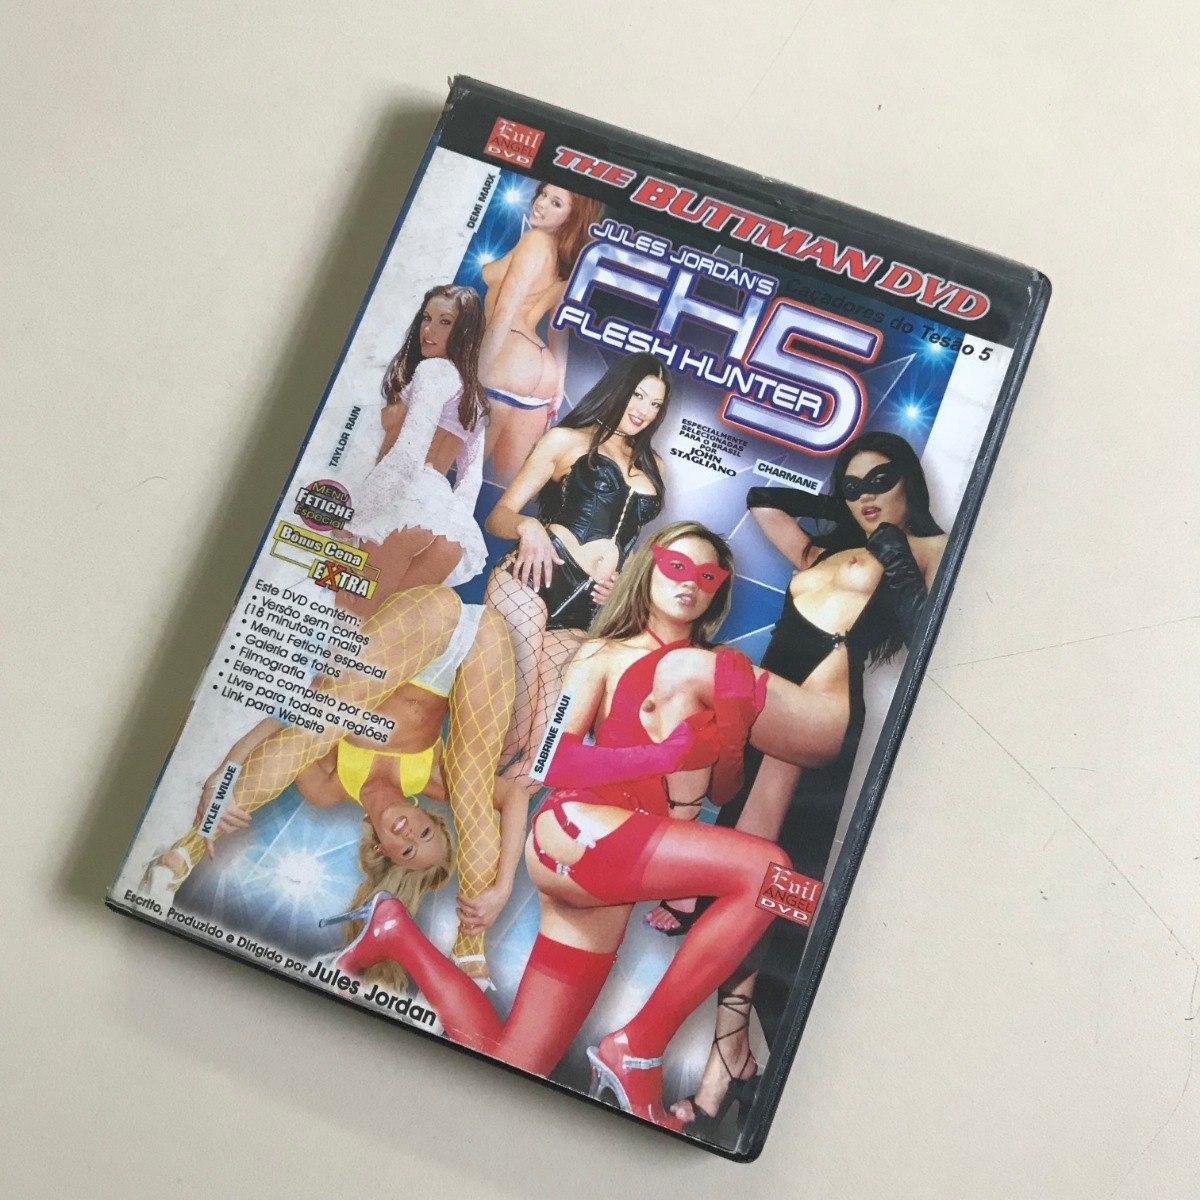 flesh hunter dvd